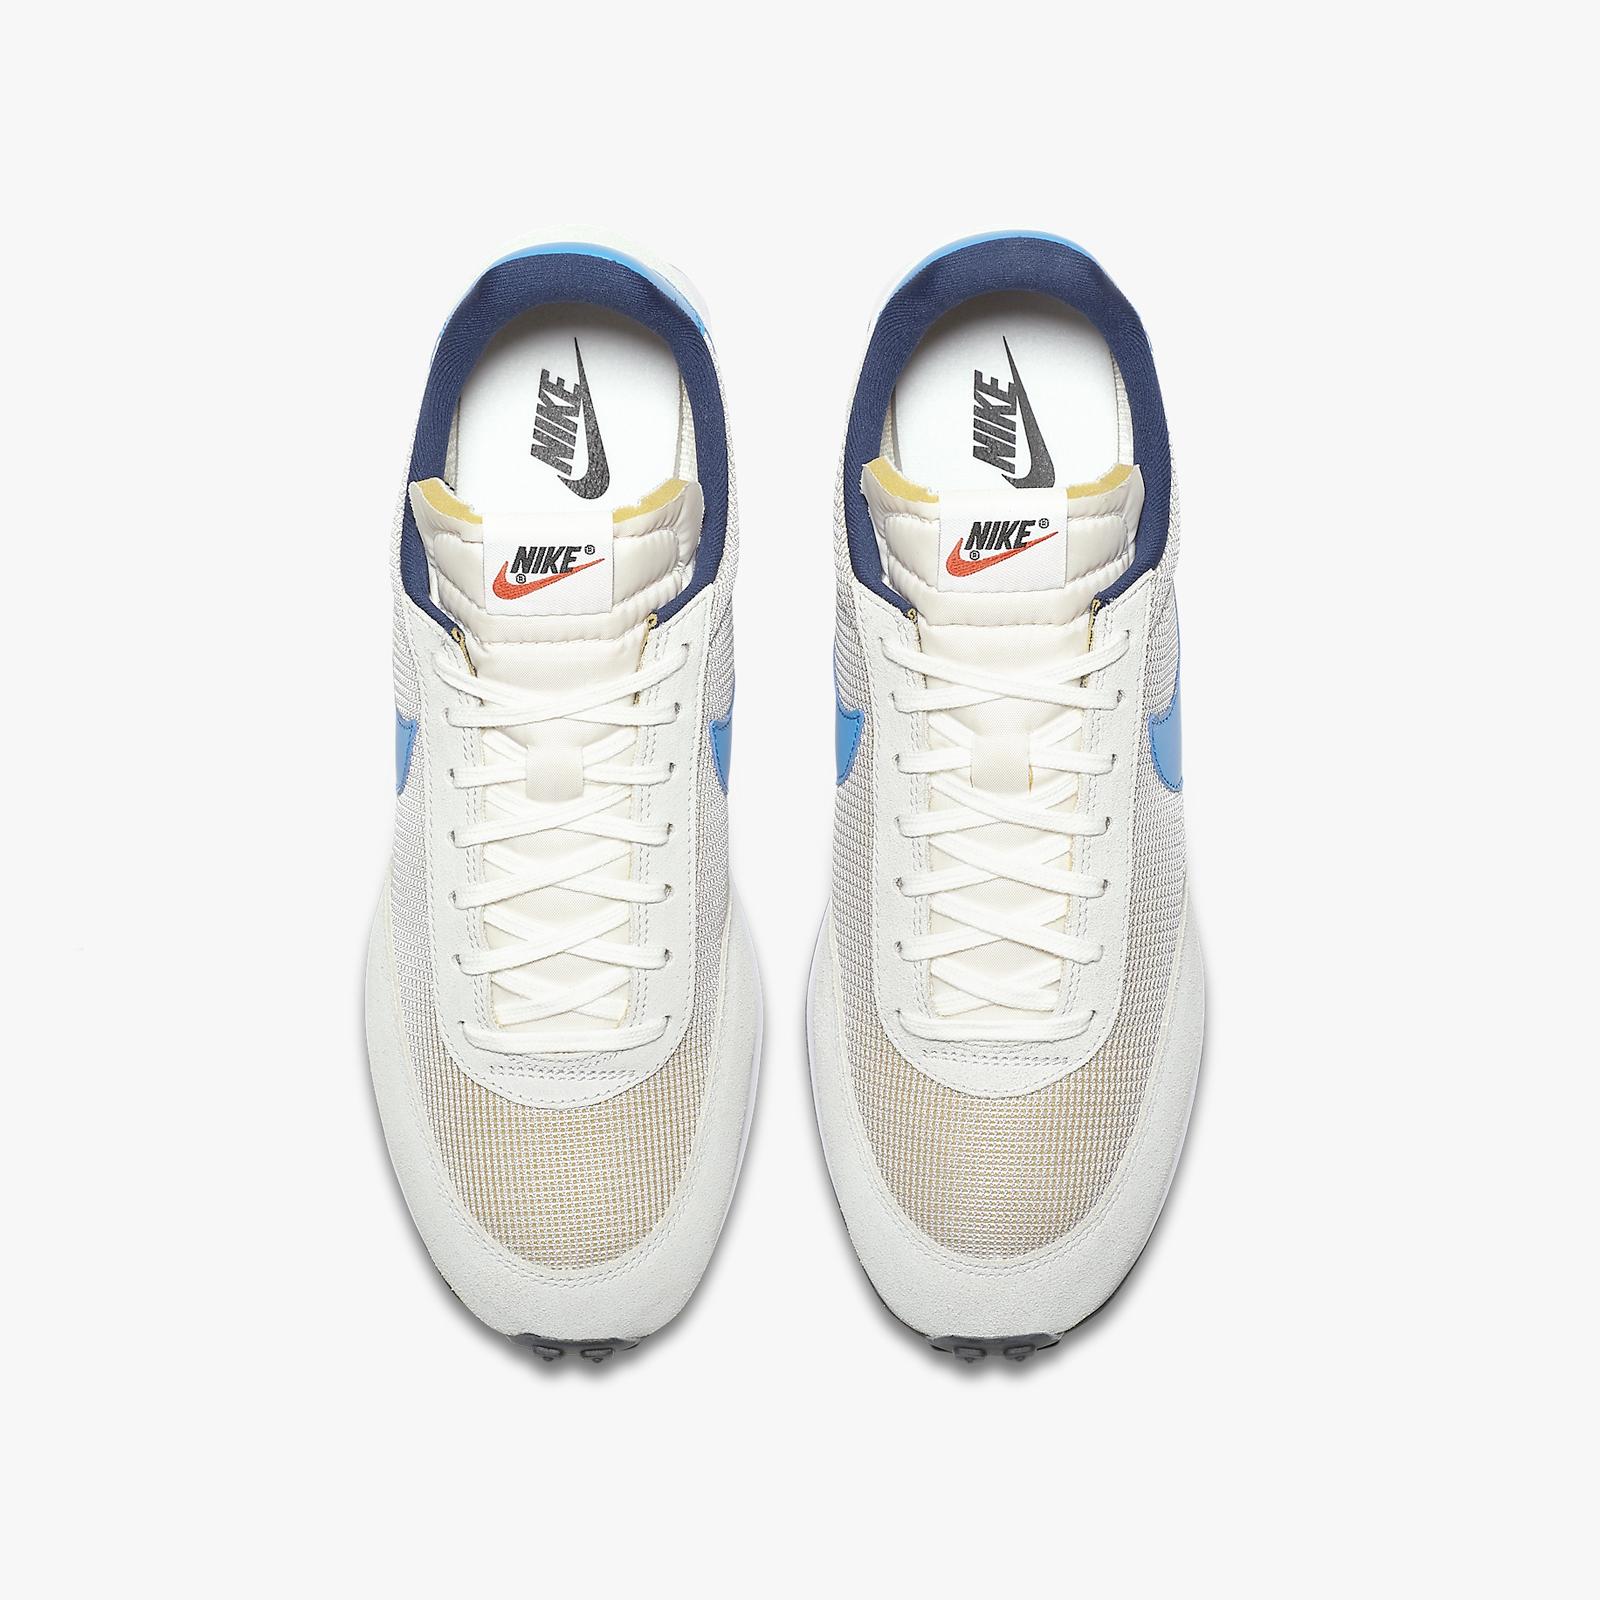 b933caf05721 Nike Air Tailwind 79 OG - Bq5878-001 - Sneakersnstuff